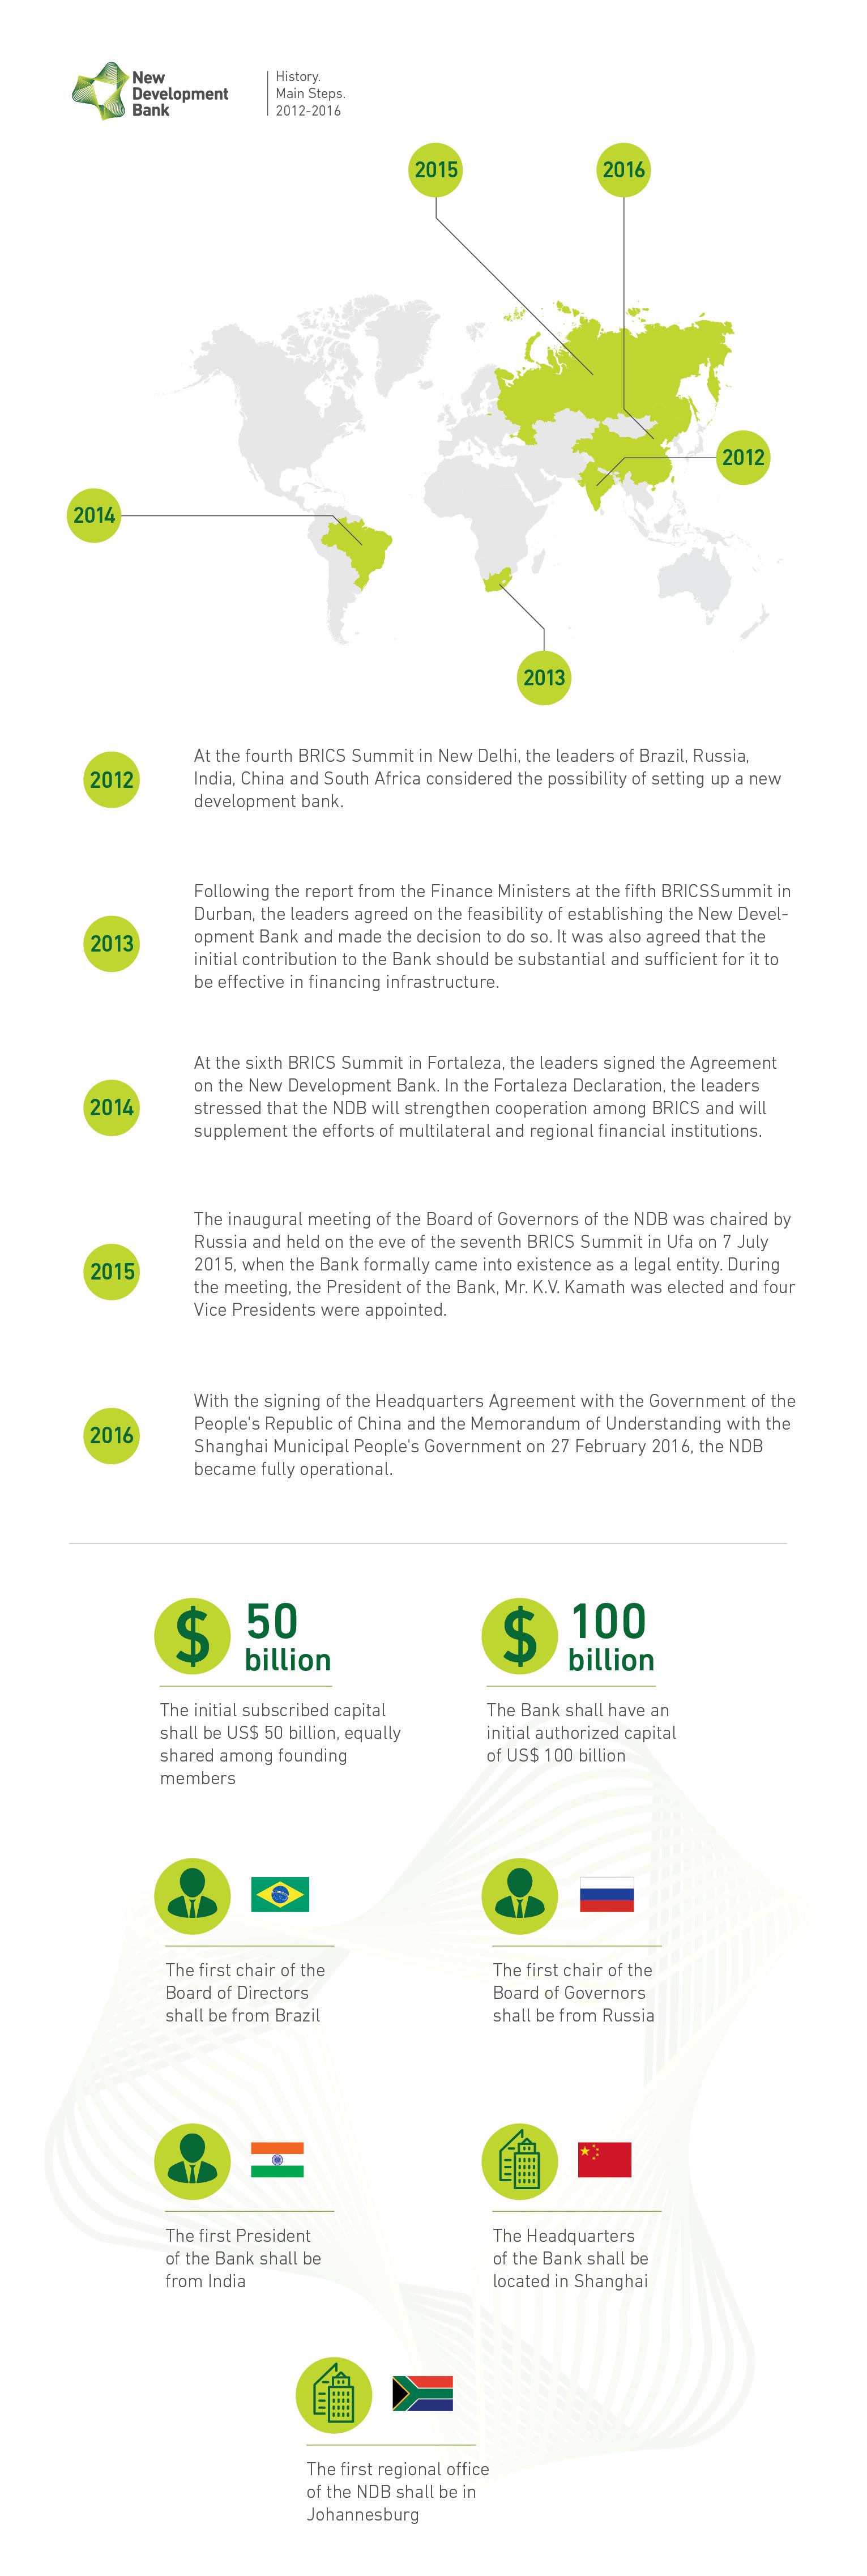 History New Development Bank